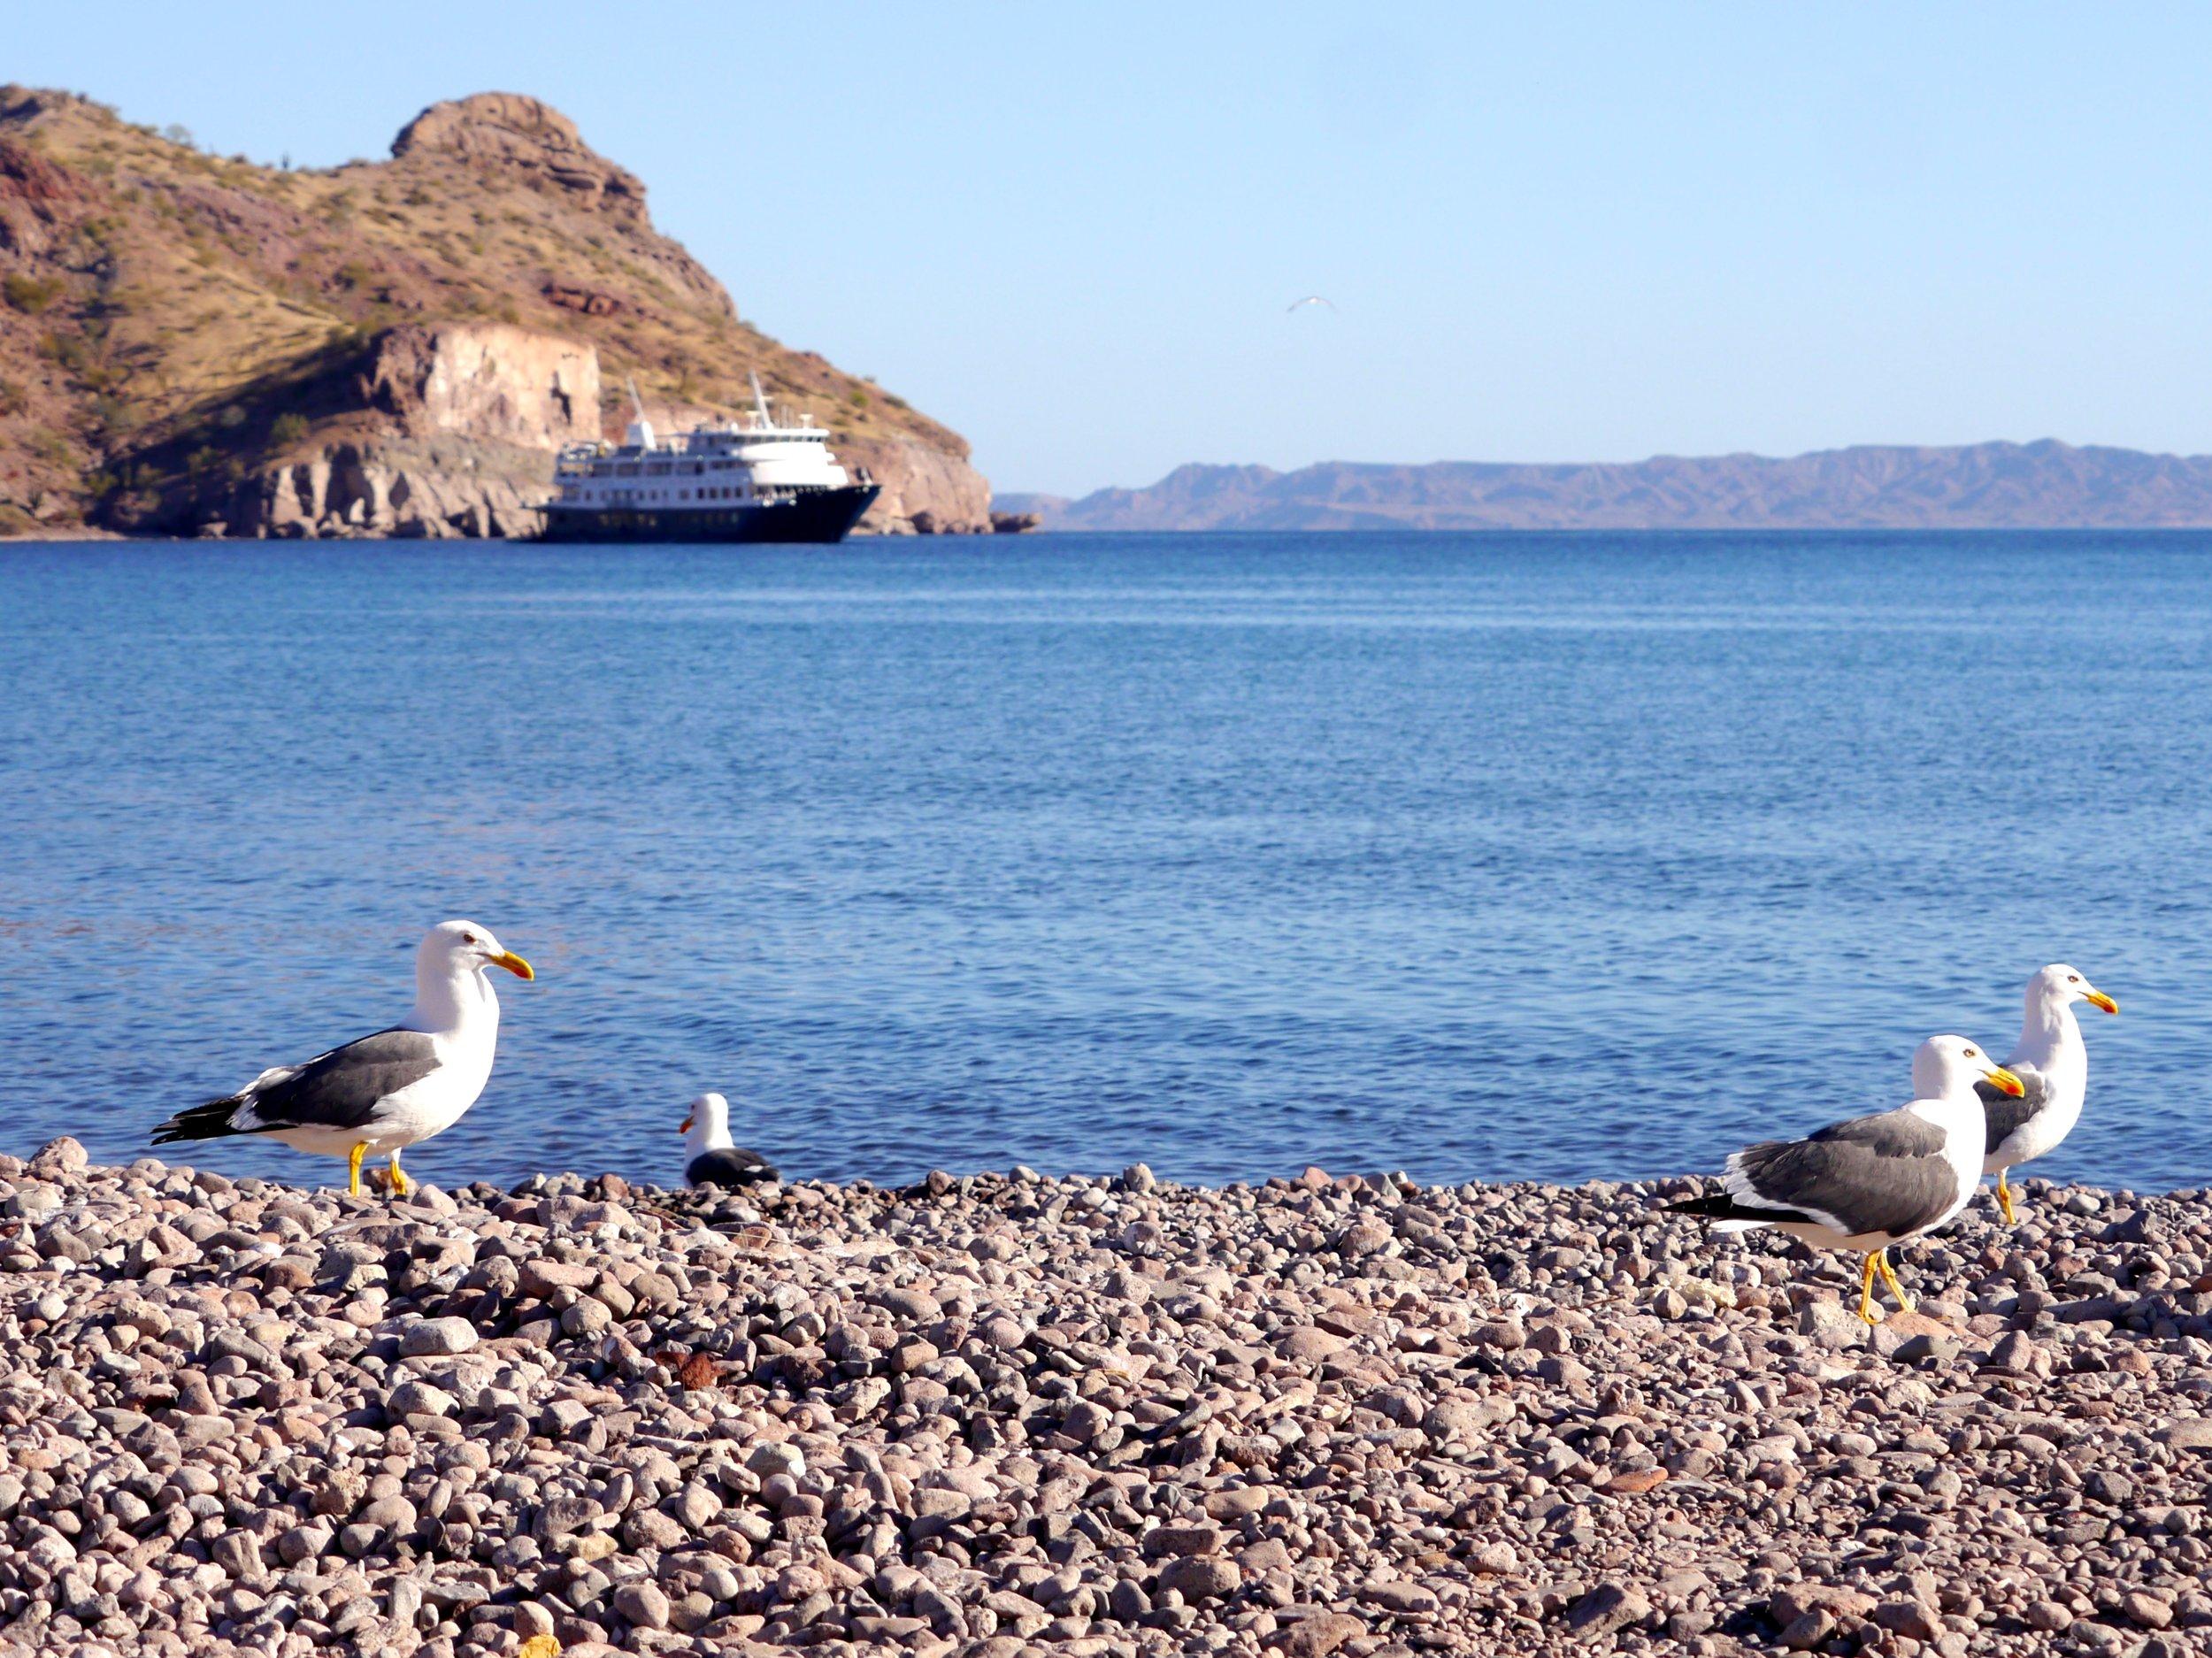 3-27-17 Yellow-legged Gull ship copy.jpg